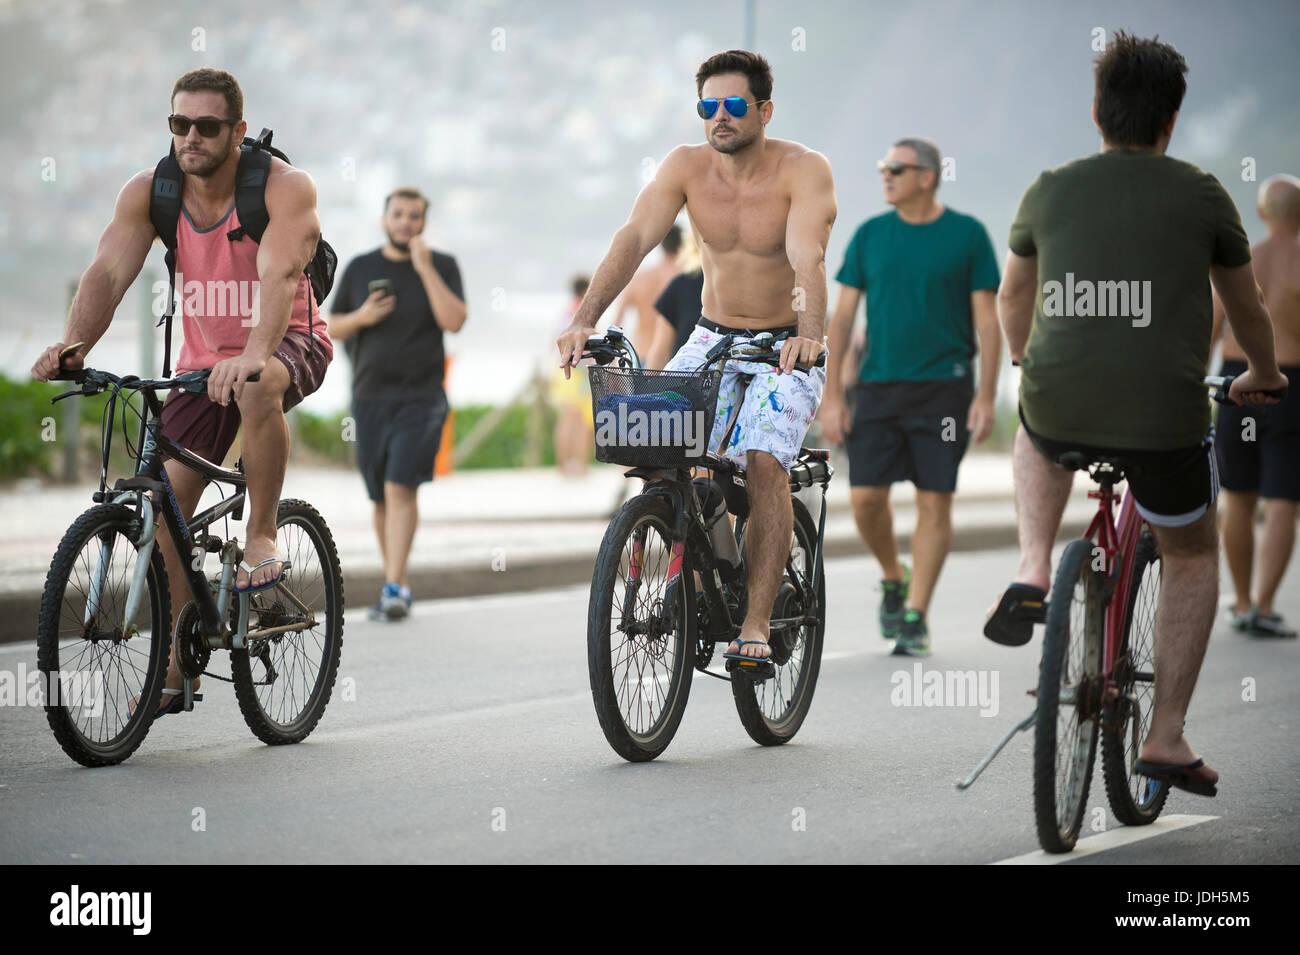 RIO DE JANEIRO - MARCH 26, 2017: Brazilians ride bicycles alongside pedestrians on the Ipanema Beach beachfront - Stock Image